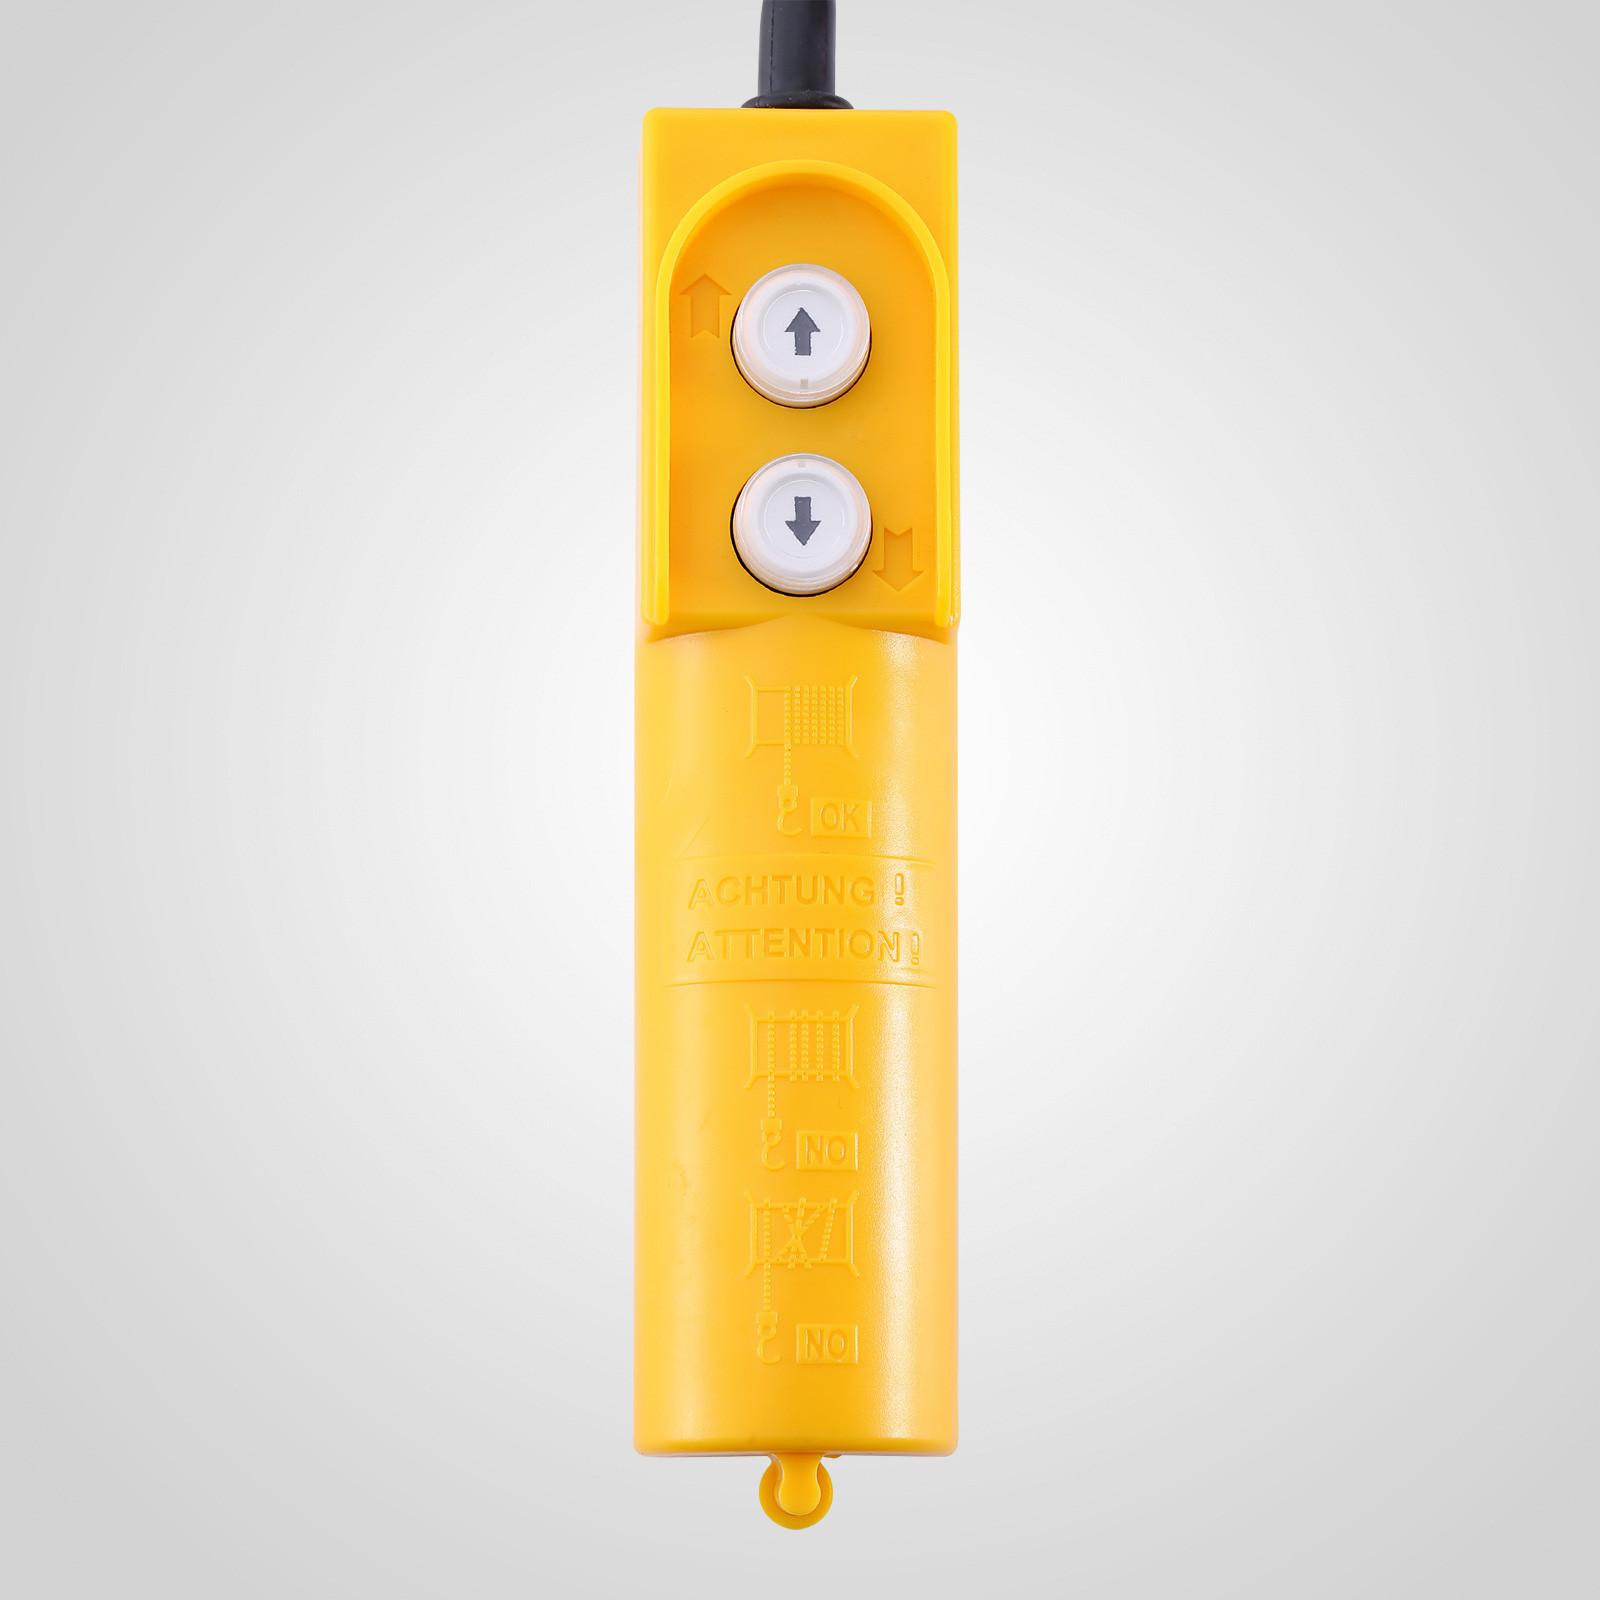 100kg-900kg-Electric-Hoist-Winch-Lifting-Engine-Crane-Cable-Lift-Hook-Garage miniature 59